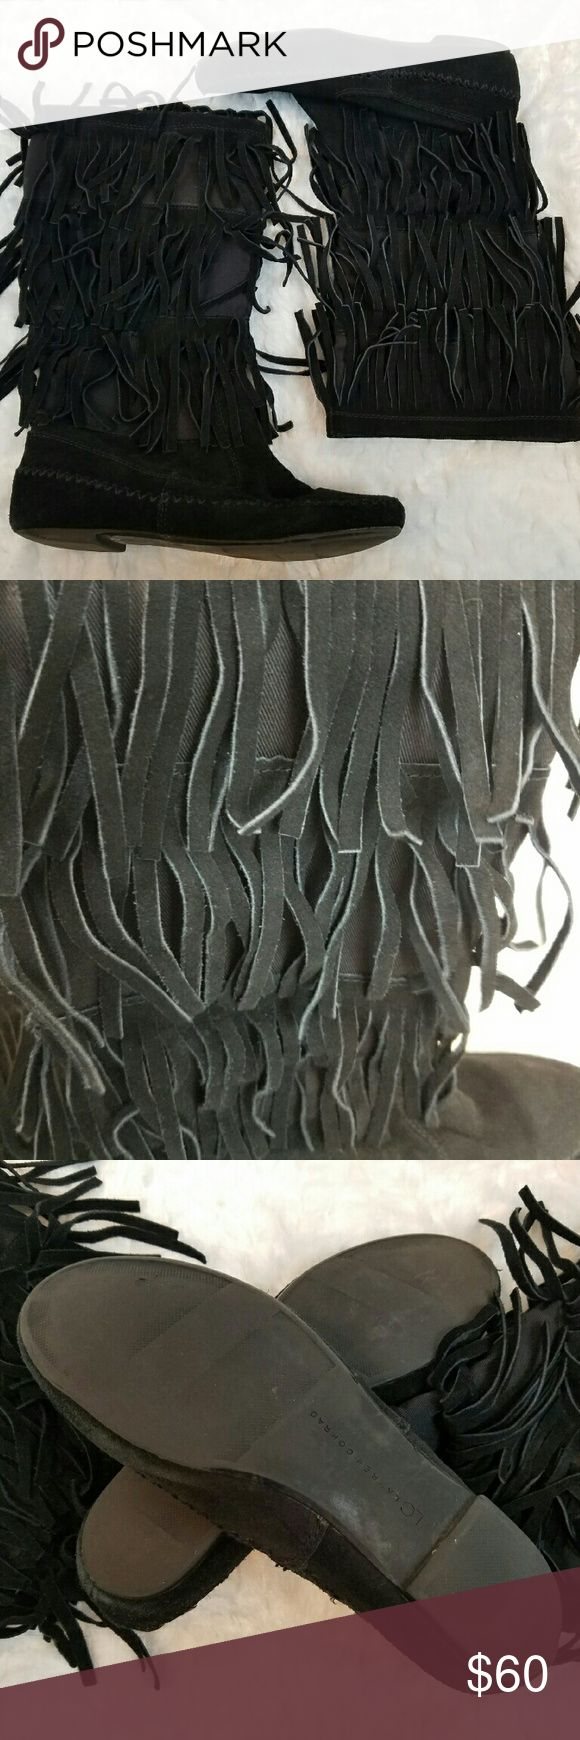 LC Lauren Conrad Mikka Fringe Suede Mocassin LC Lauren Conrad brand Mikka style  Suede fringe Mocassin LC Lauren Conrad Shoes Ankle Boots & Booties